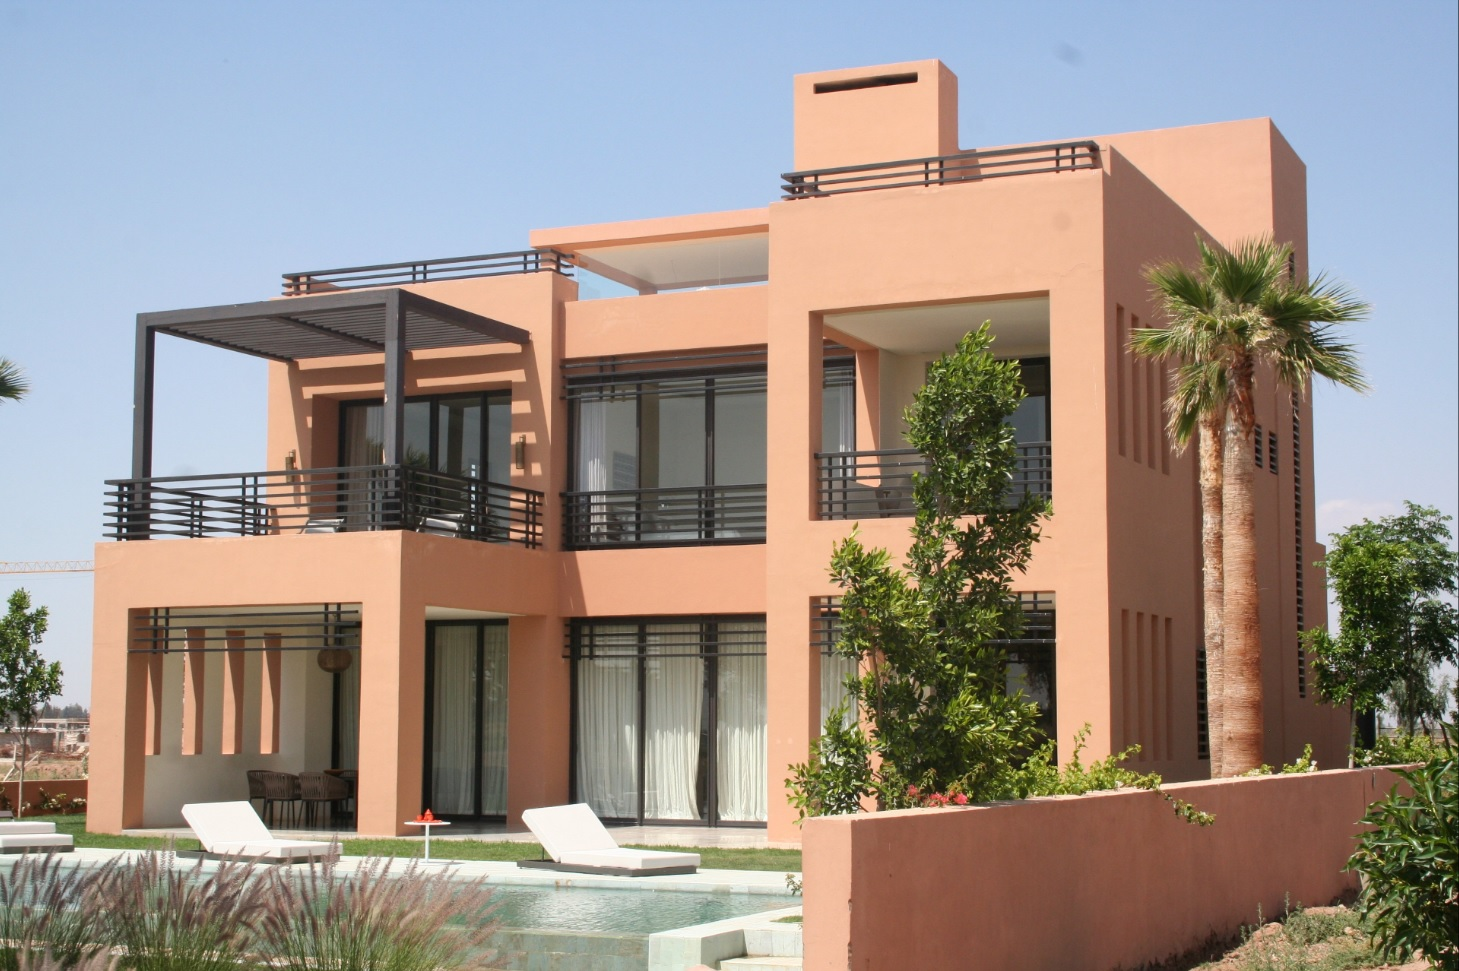 Obm maison obm building for Decoration villa moderne